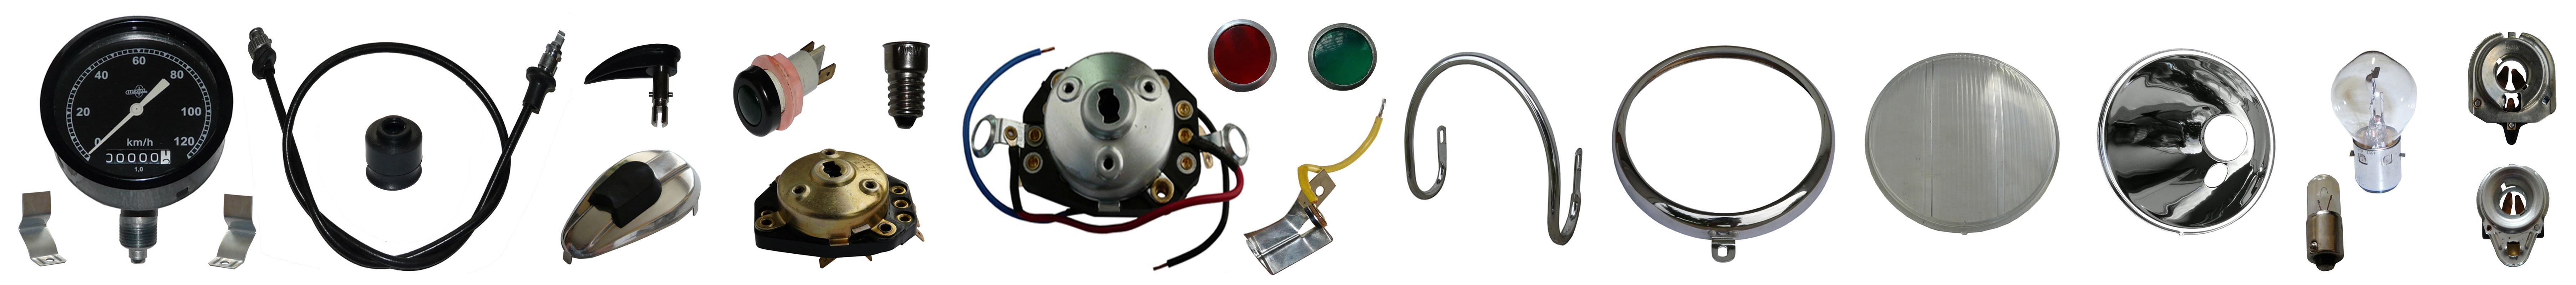 IFA MZ BK 350 Ersatzteile Lampe Tachometer